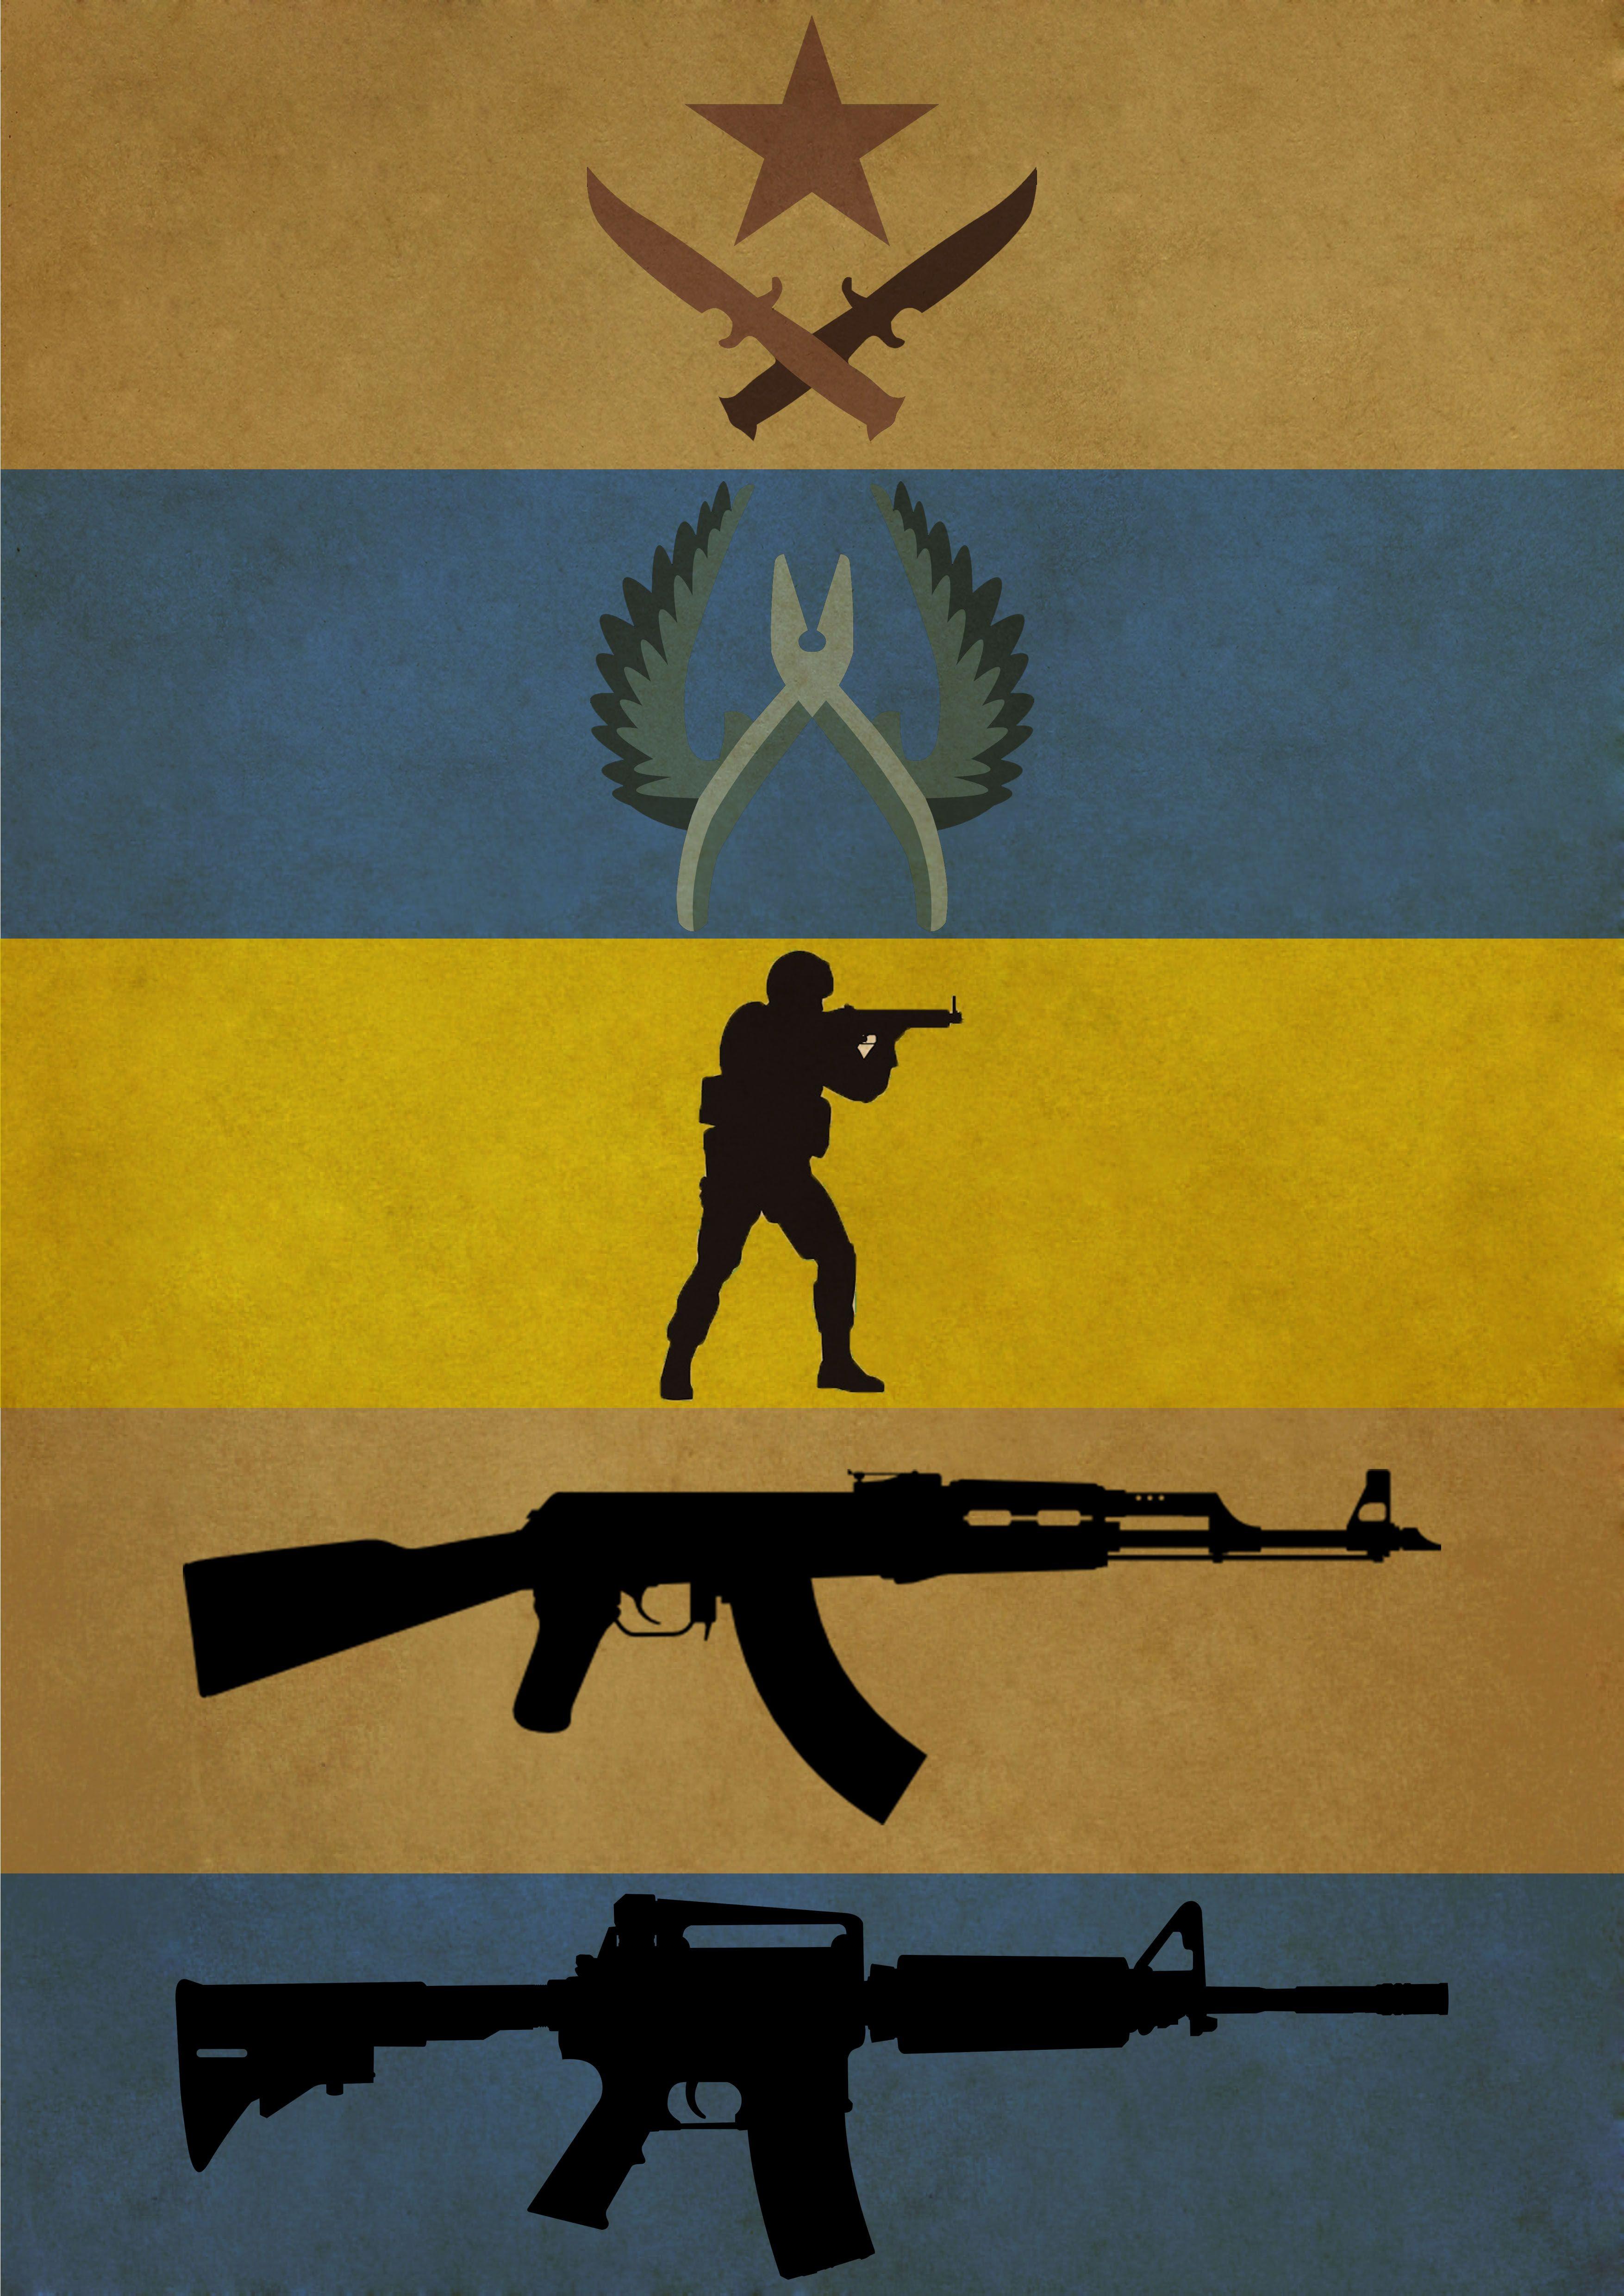 Counter Strike Poster i made